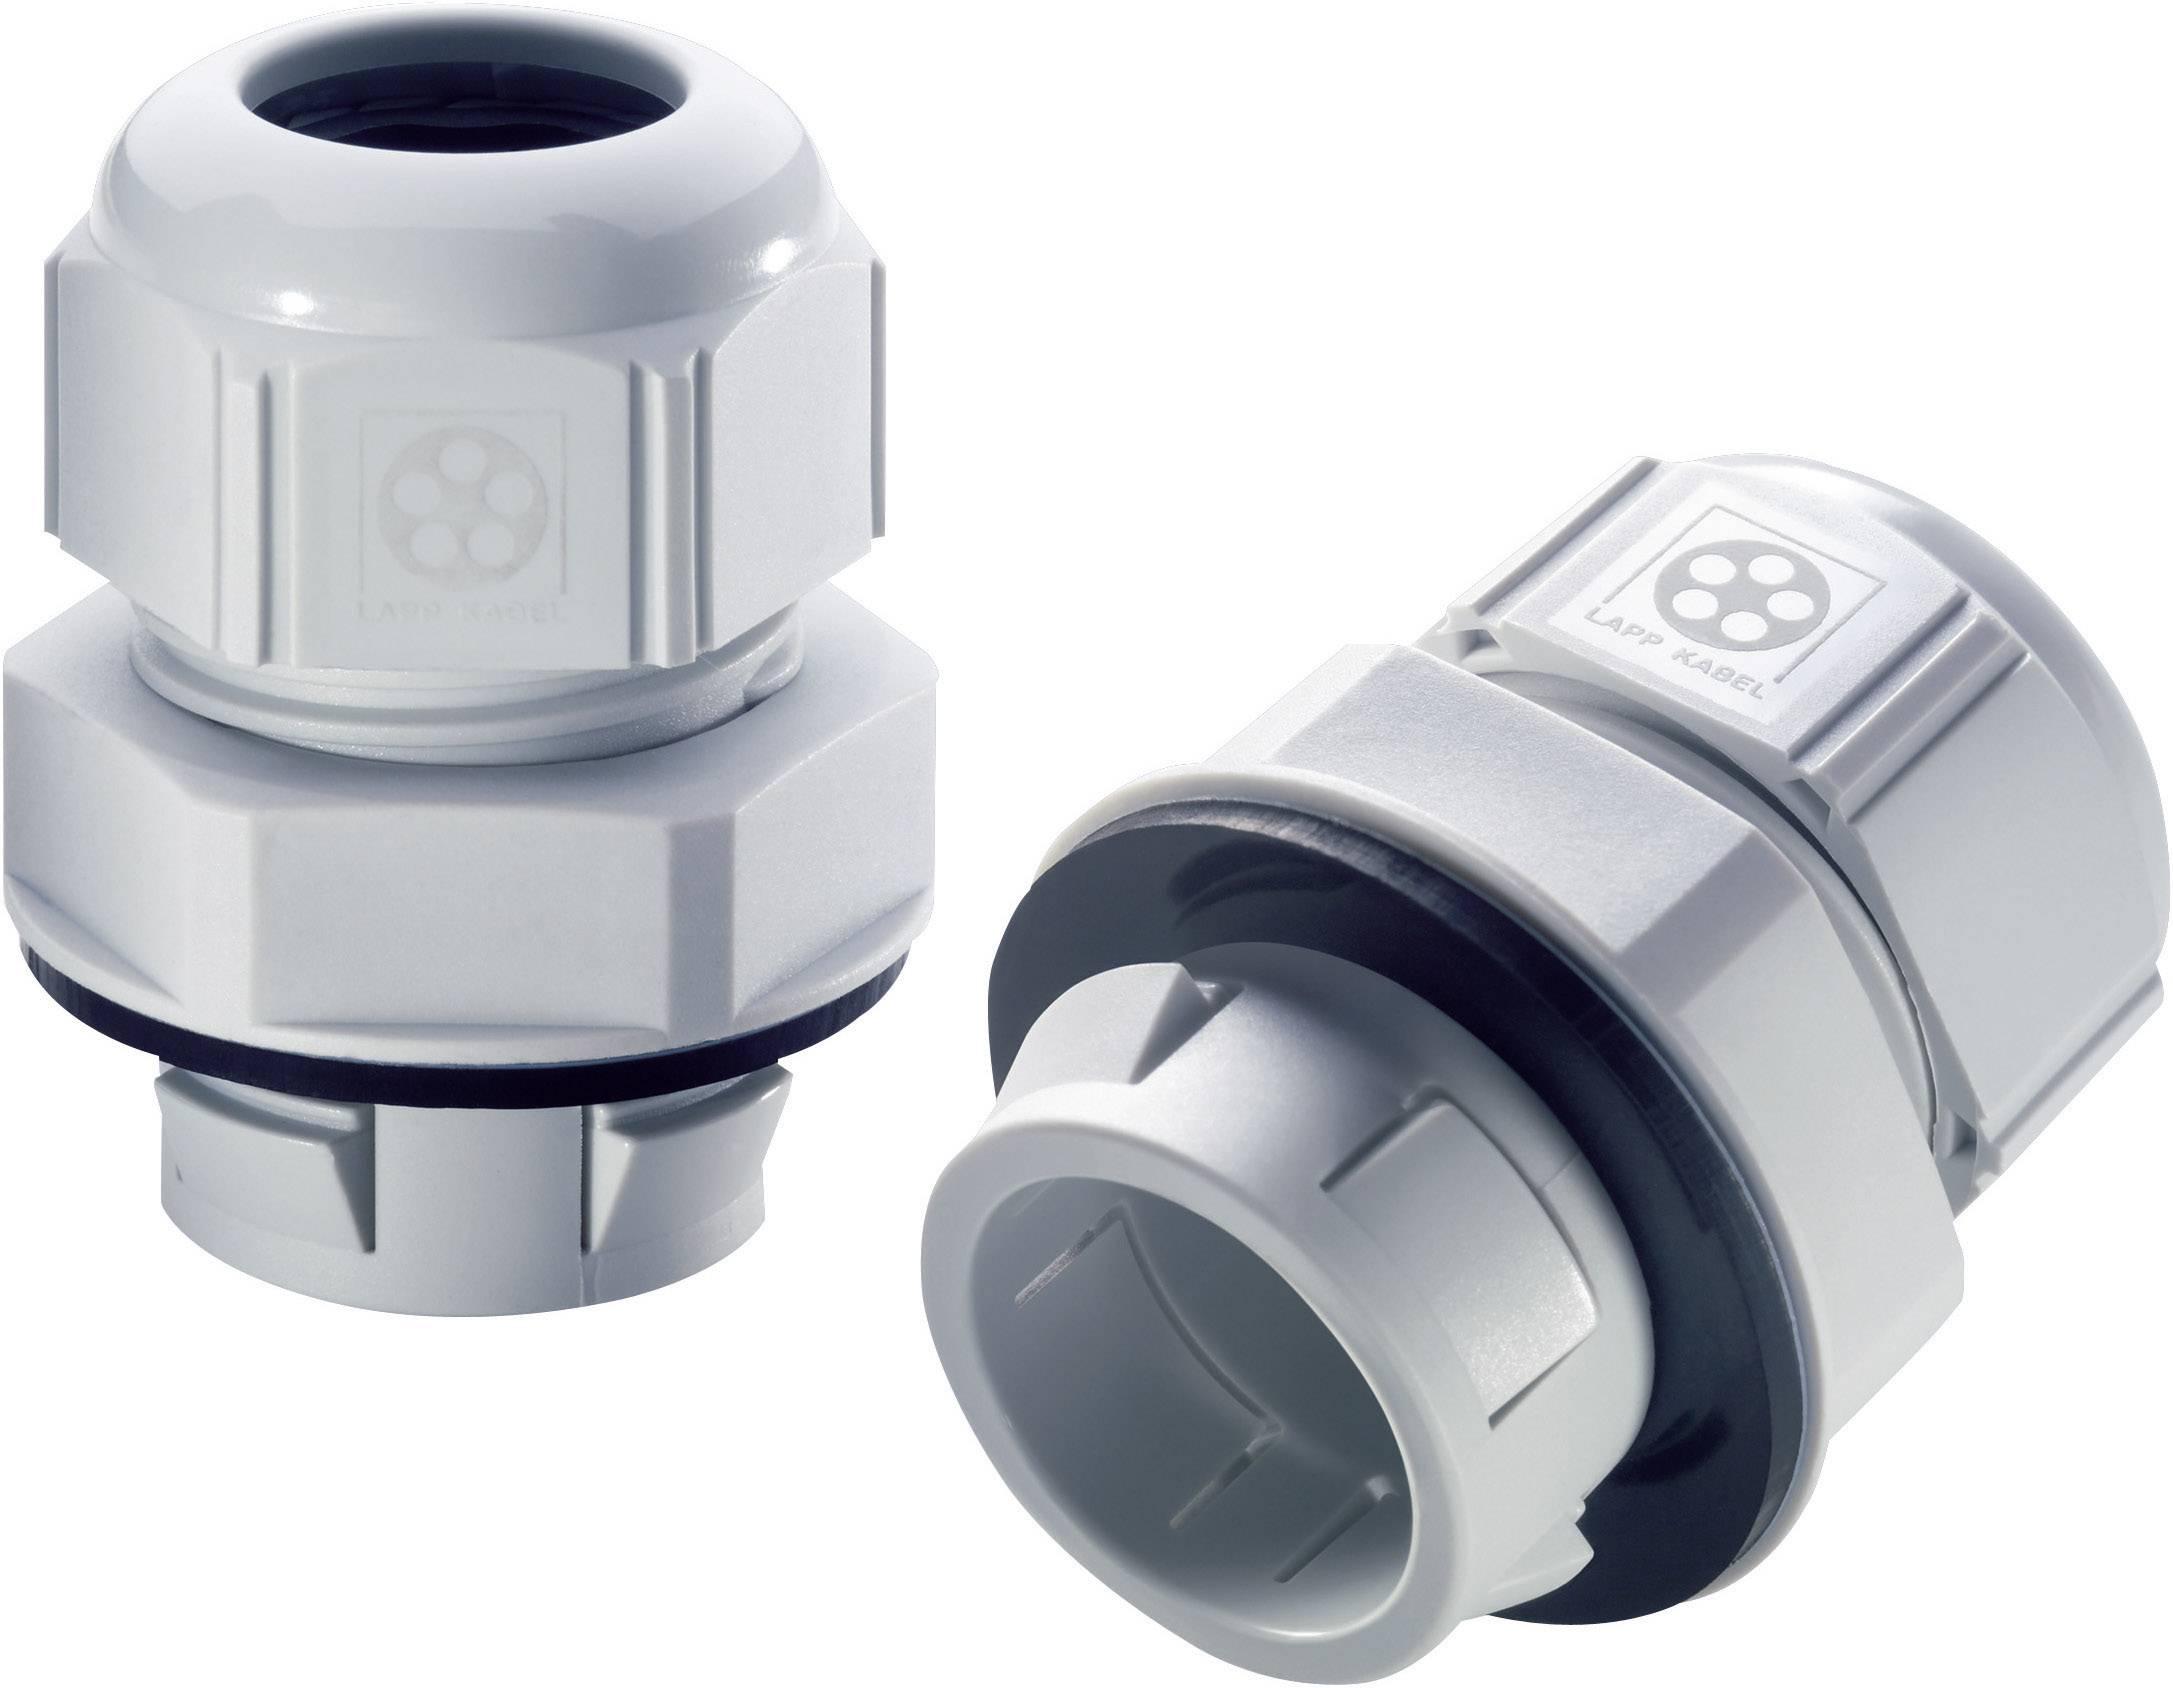 Káblová priechodka LappKabel SKINTOP® CLICK 12, polyamid, svetlo sivá (RAL 7035), 1 ks